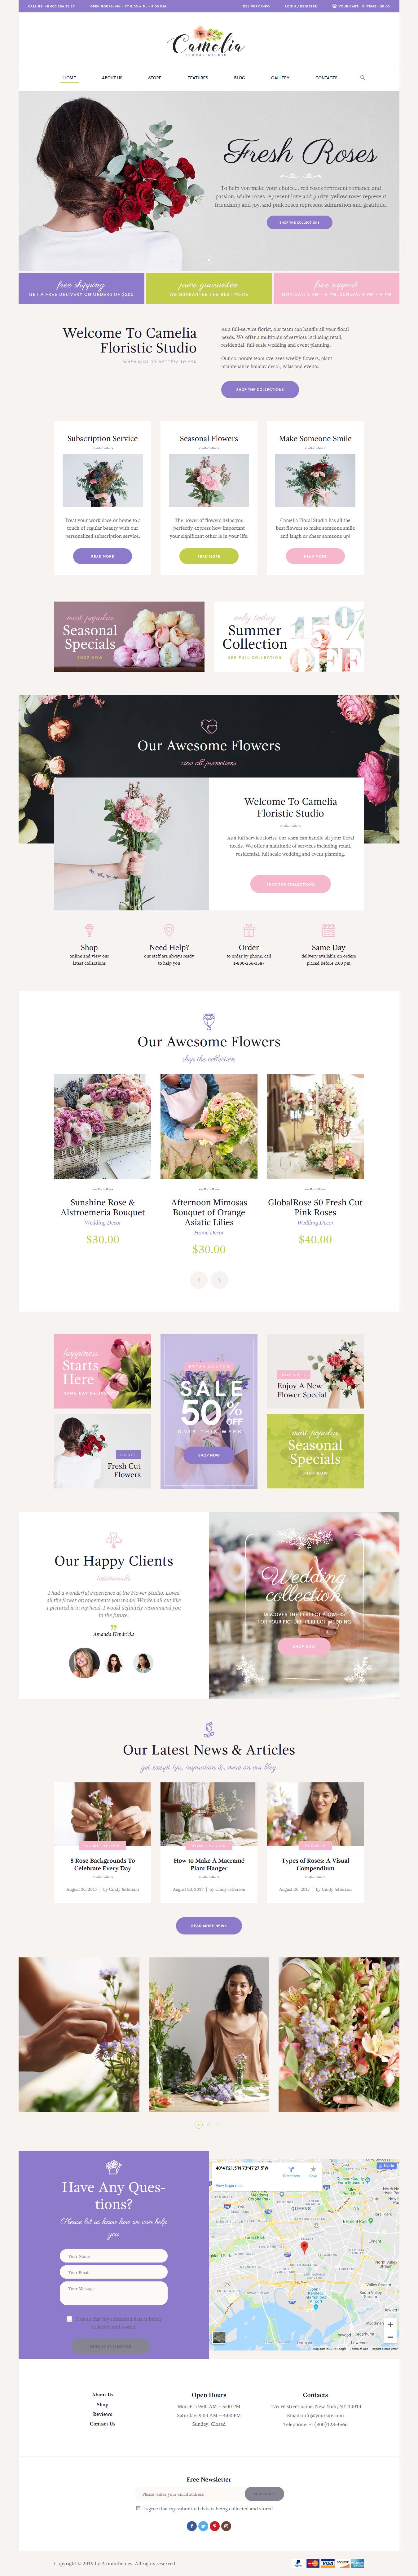 Camelia – Best Premium Florist and Floriculture WordPress Theme